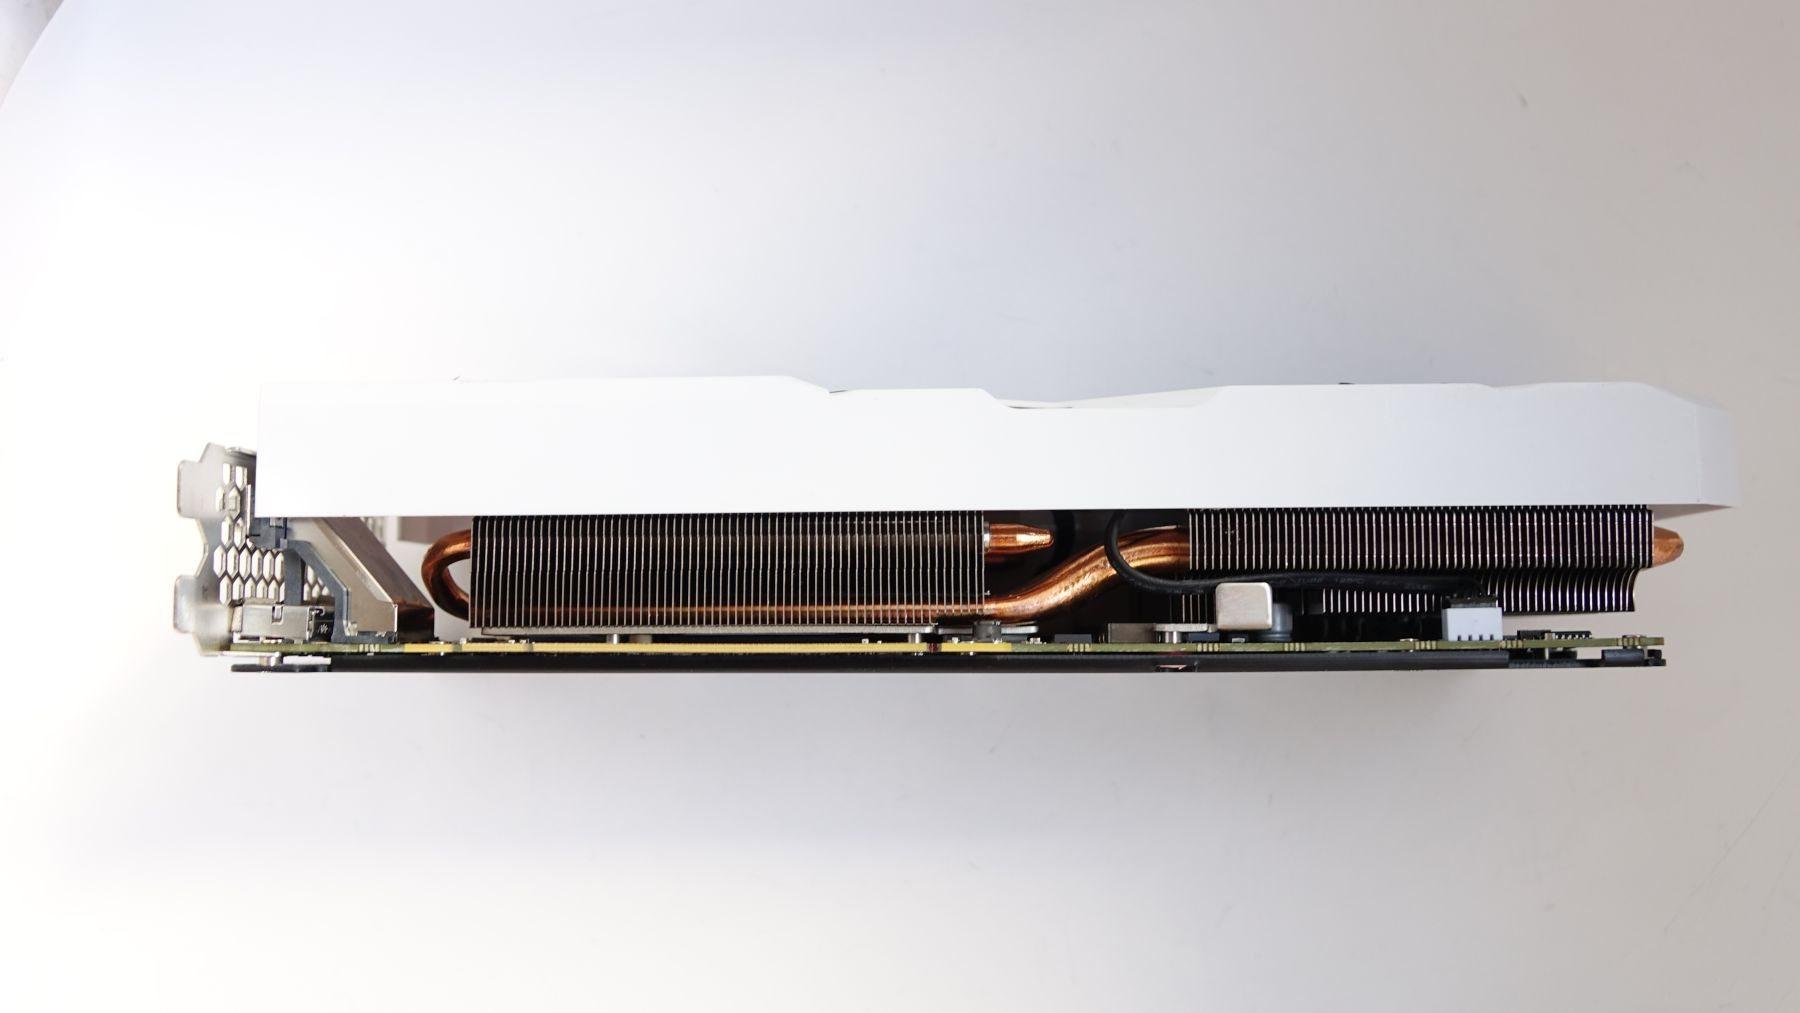 Palit GeForce GTX 1080 GameRock Premium Edition tubes